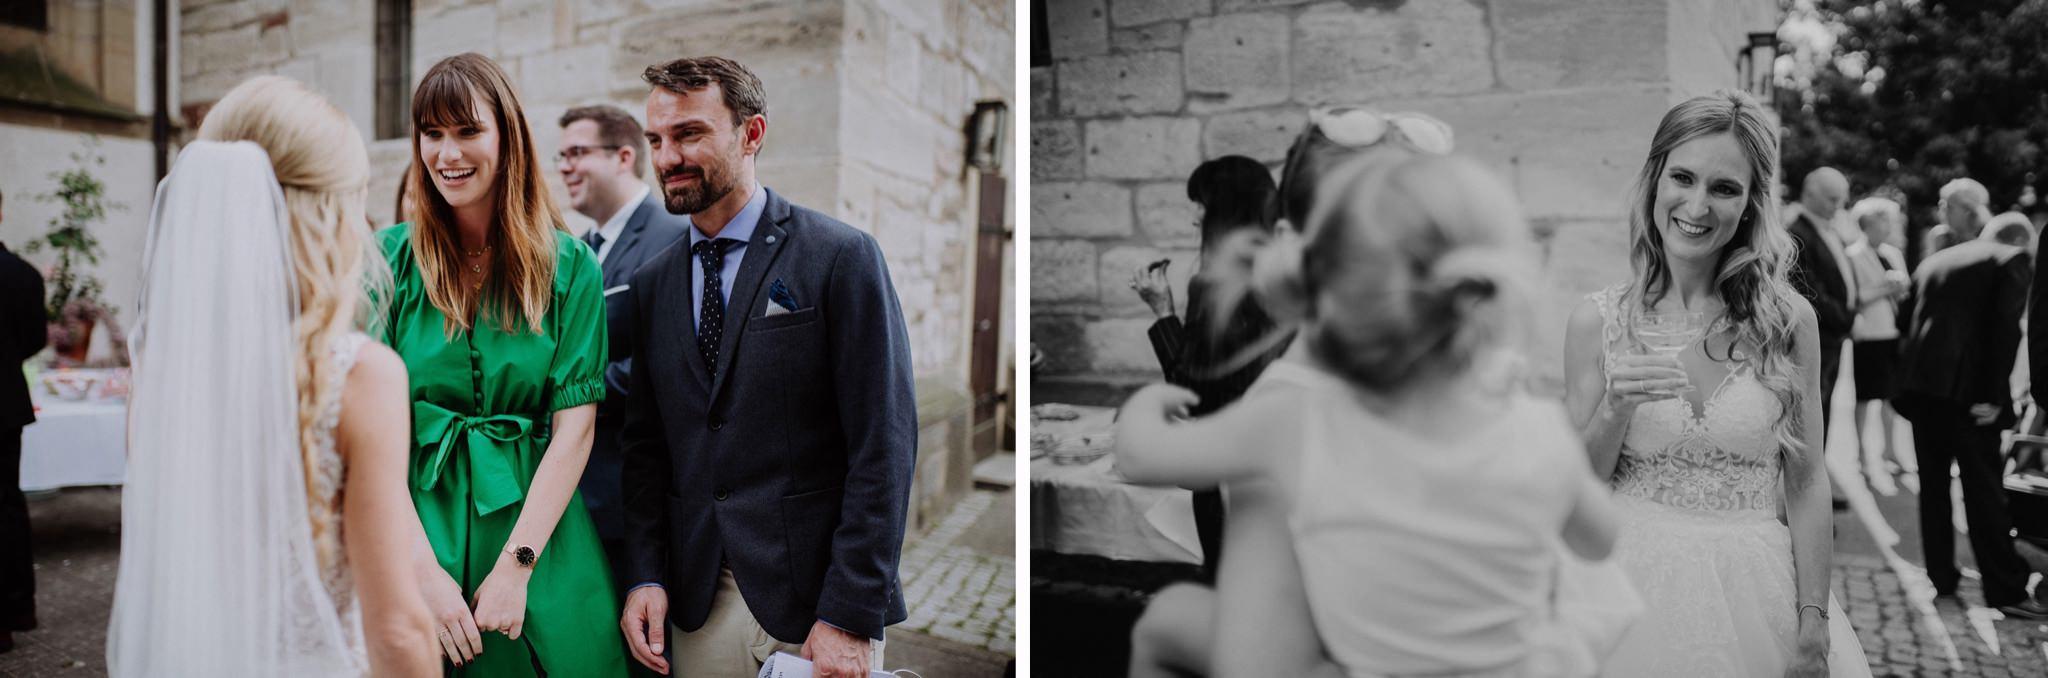 wedding photographer hamilton new zealand 1041